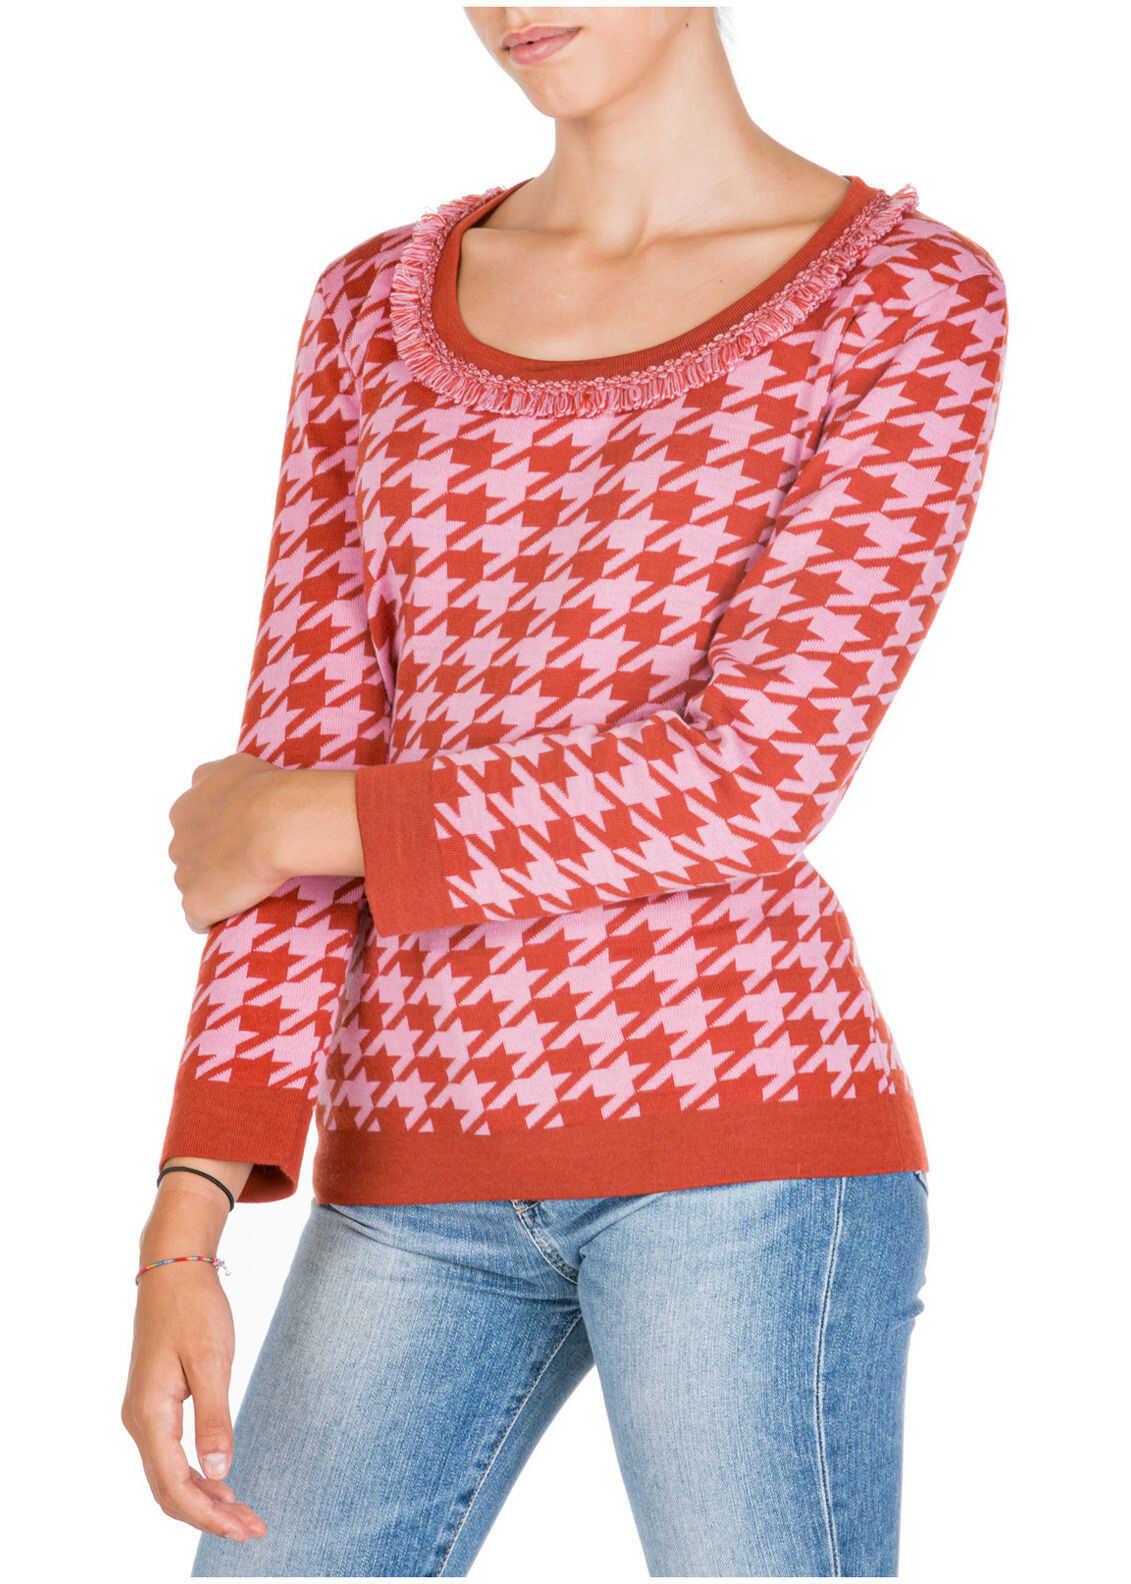 Blumarine Jumper Sweater Pink